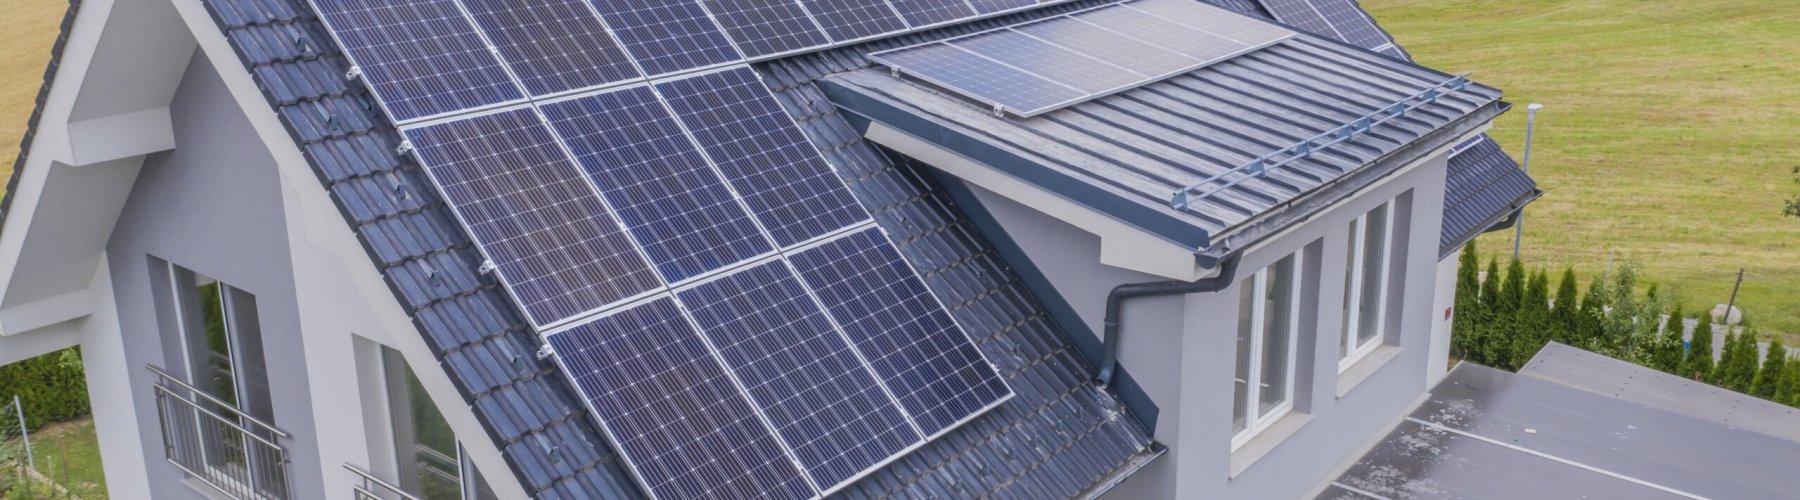 Zonnepanelen 2021 goedkoper dan ooit